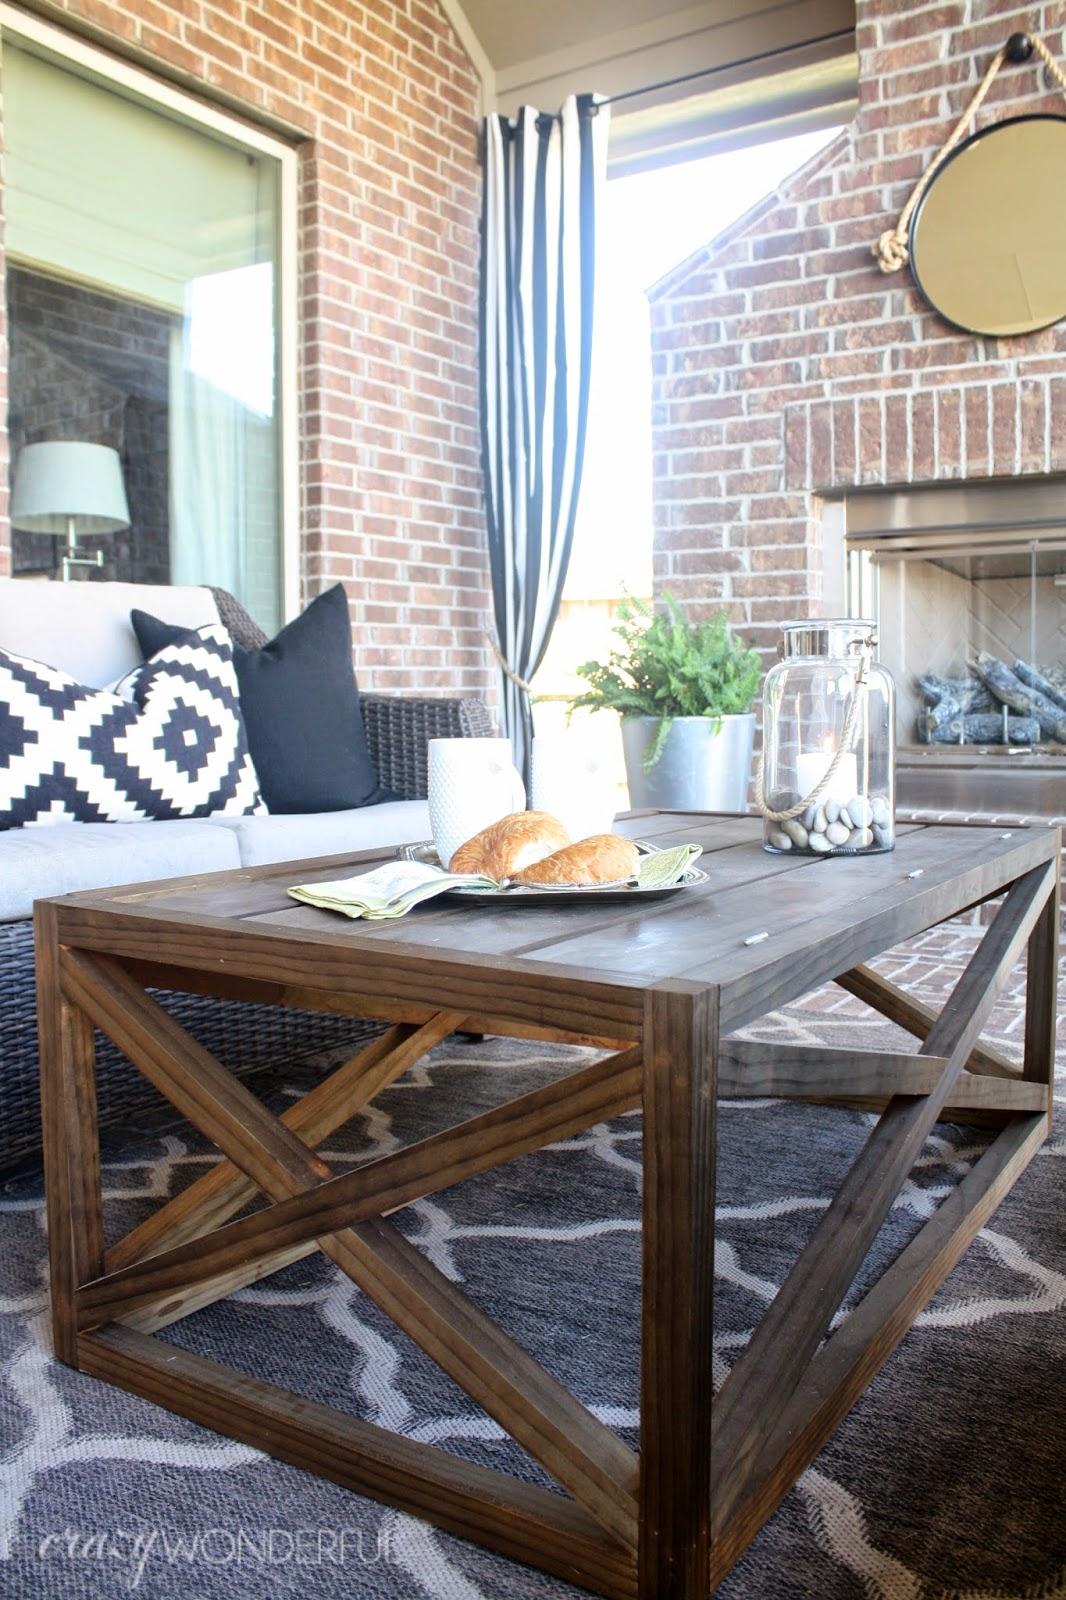 Diy outdoor coffee table with storage crazy wonderful for Diy coffee table with storage